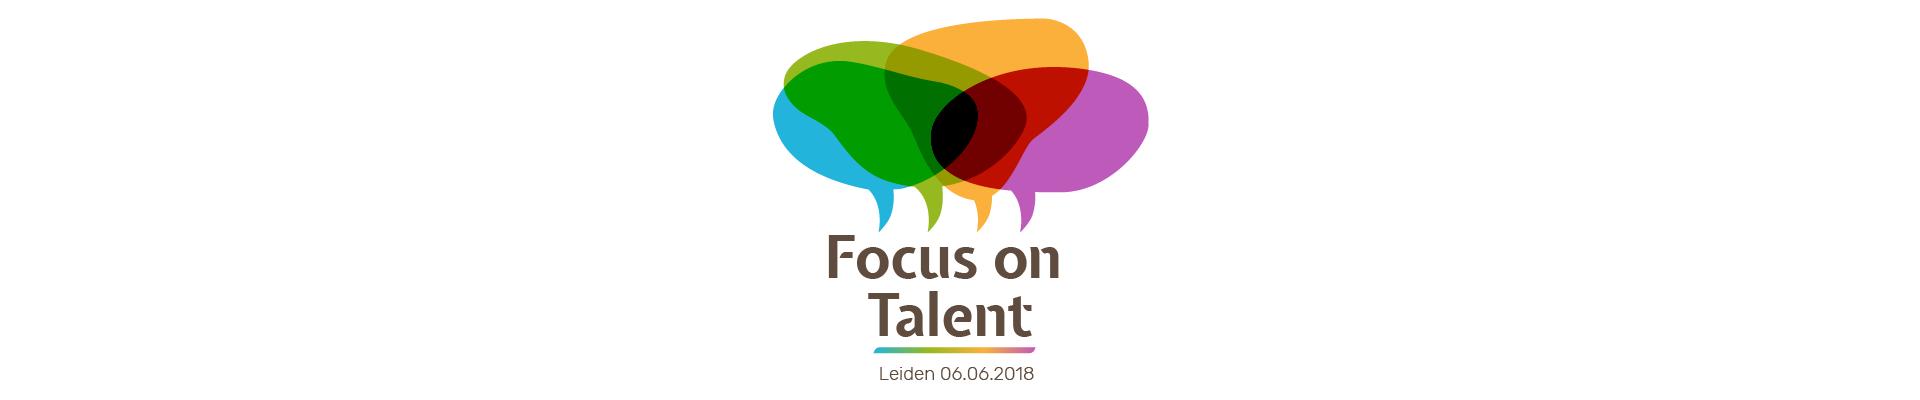 Focus on Talent